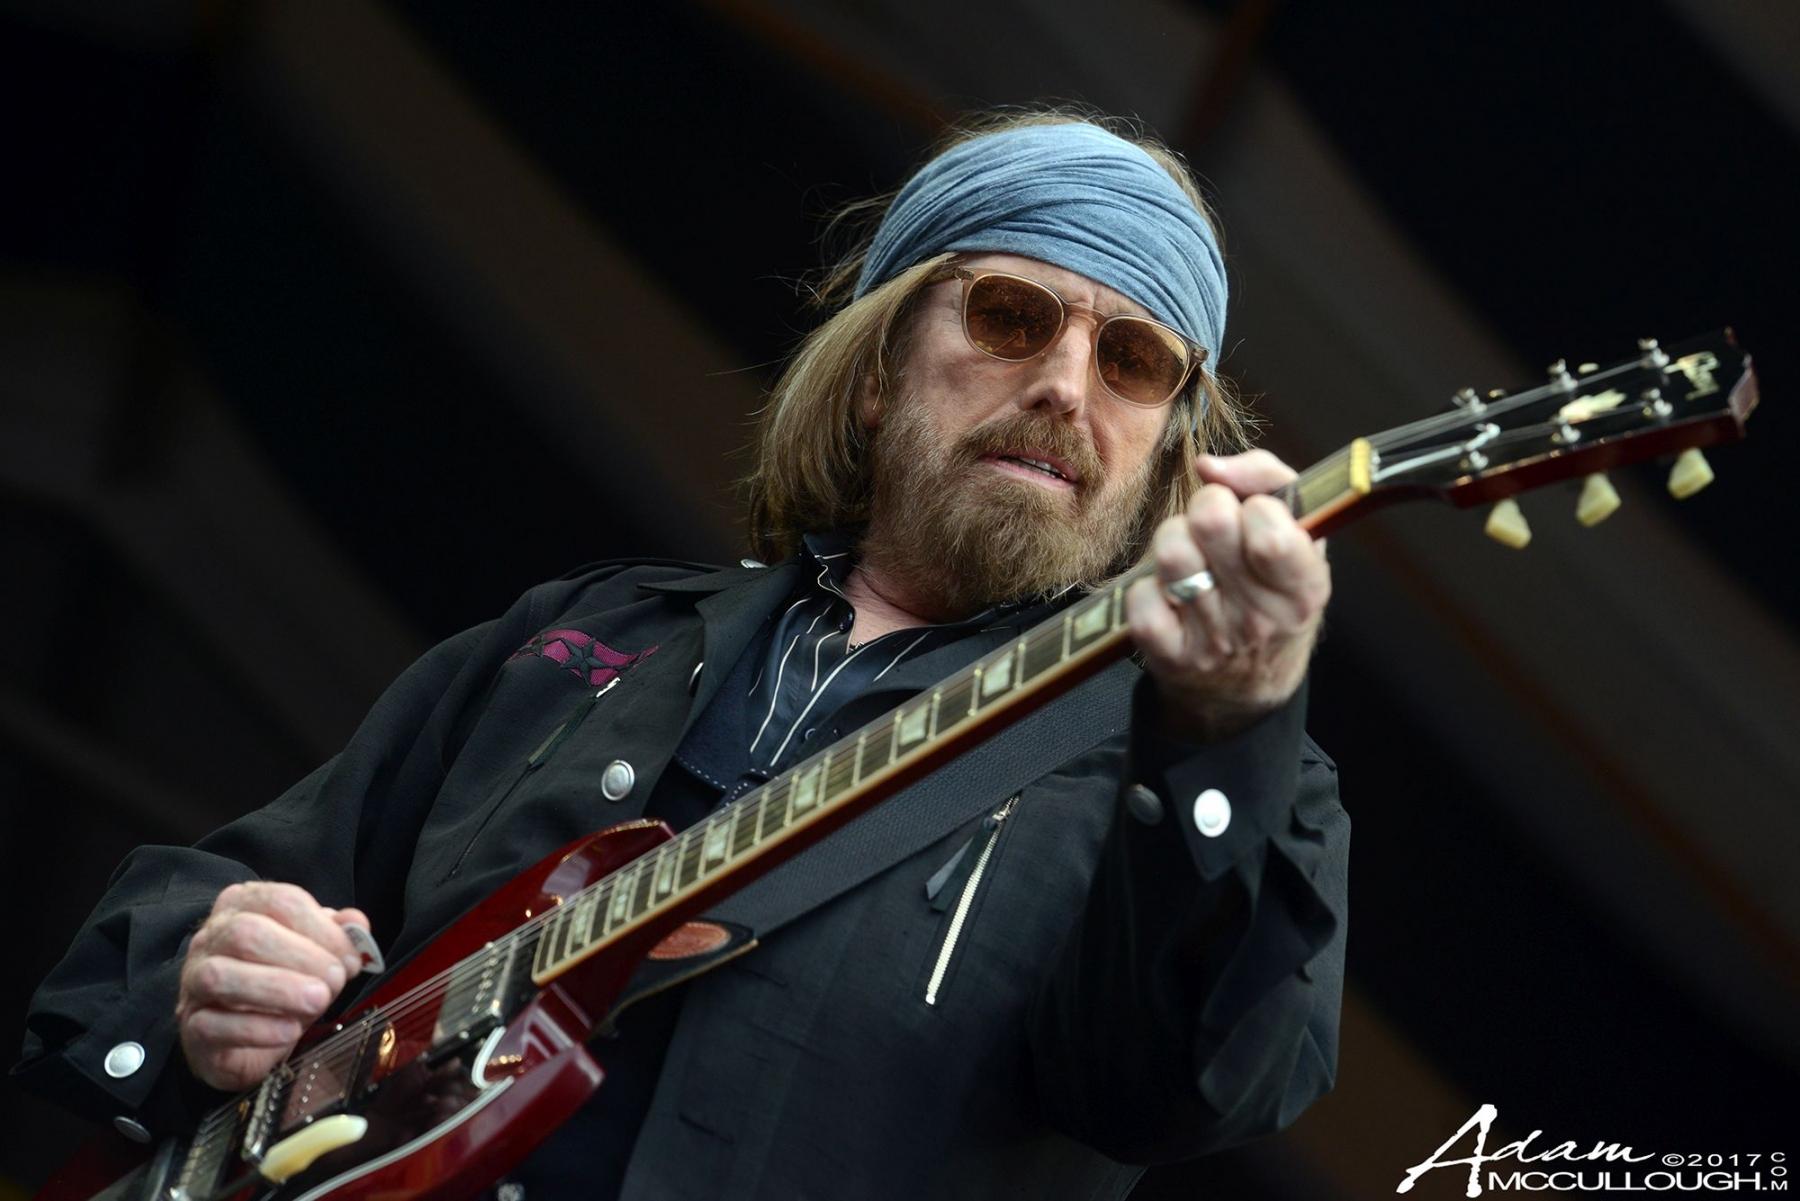 Plaat van de week: Tom Petty – You Don't Know How It Feels